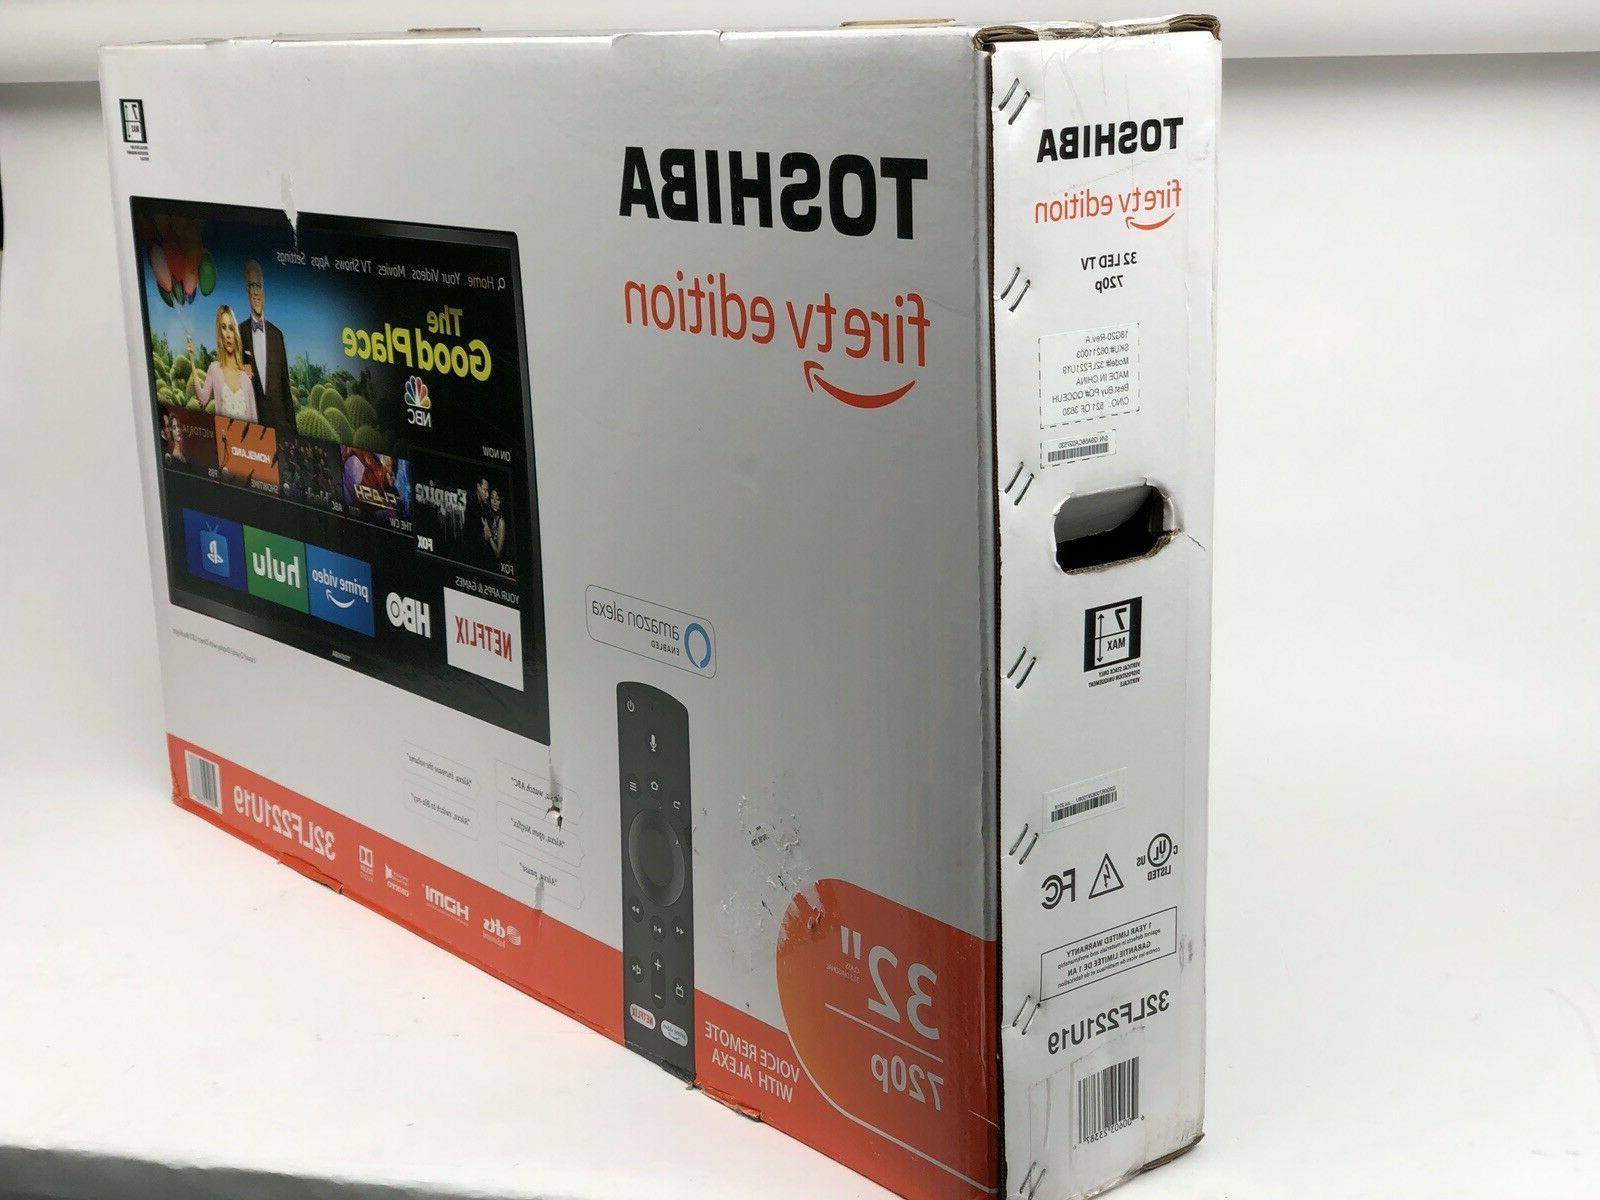 Toshiba Smart TV Edition / 720p - CV46